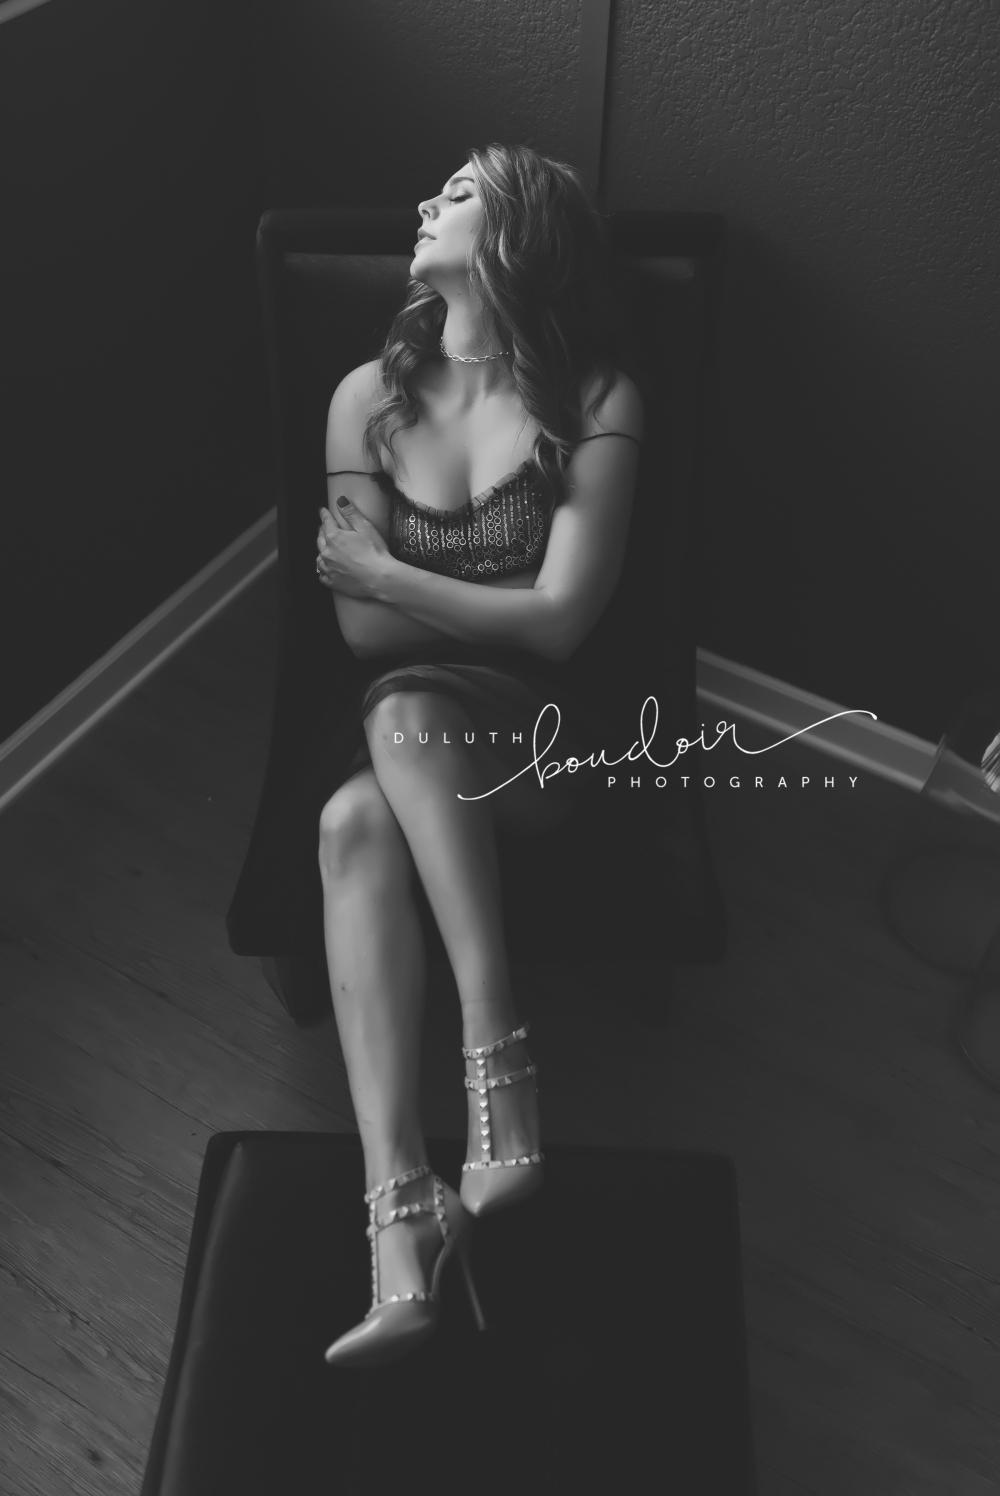 duluth_boudoir_photography_Emily_16.jpg